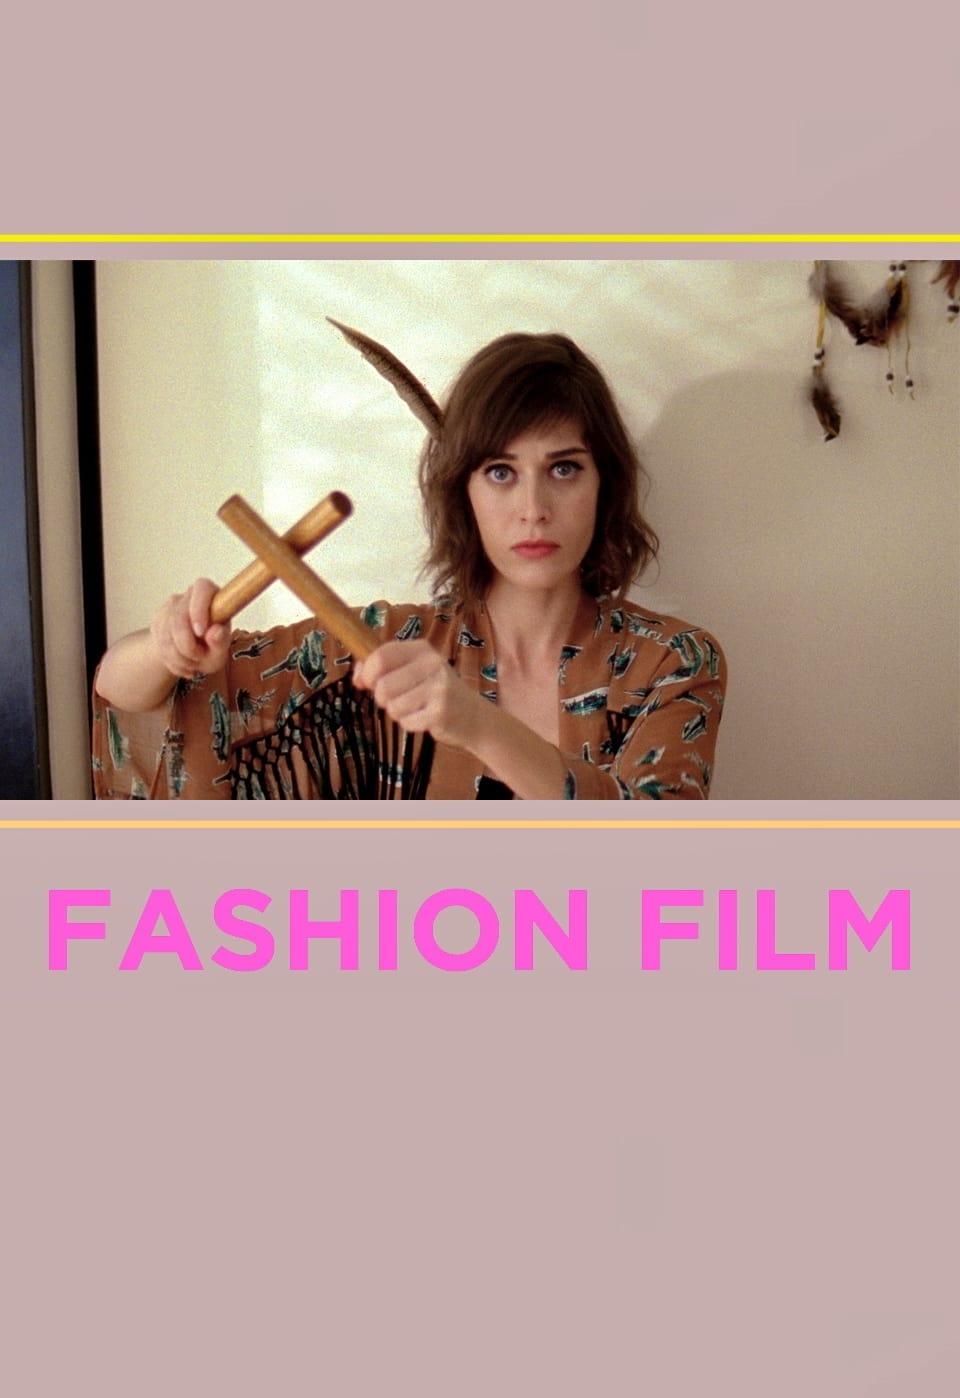 Fashion Film (2013)